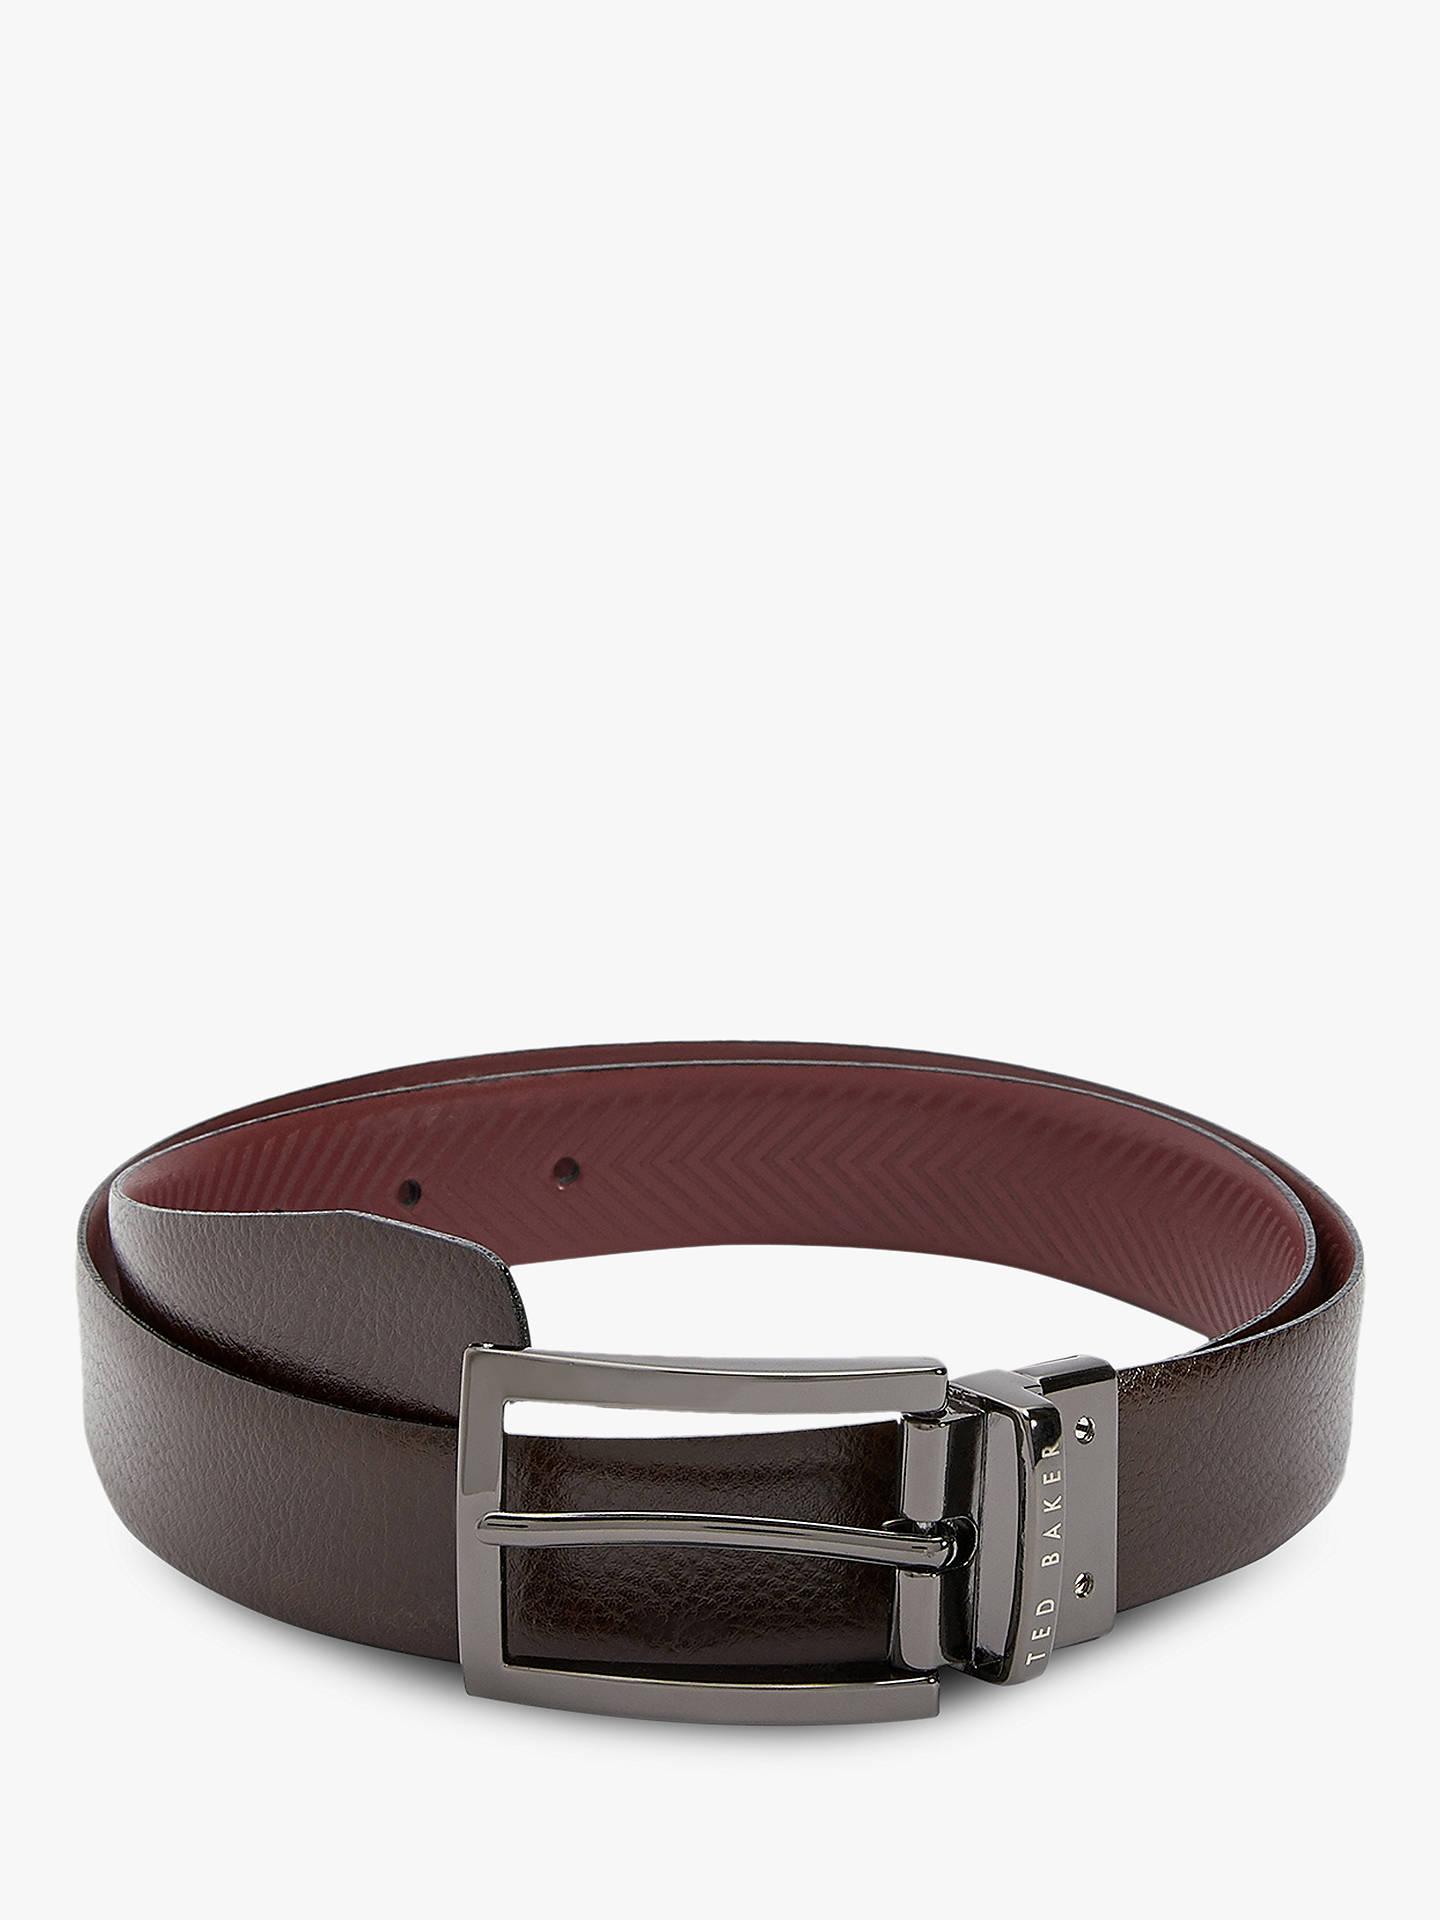 29d7133ae868 Ted Baker Hammok Reversible Leather Belt at John Lewis   Partners